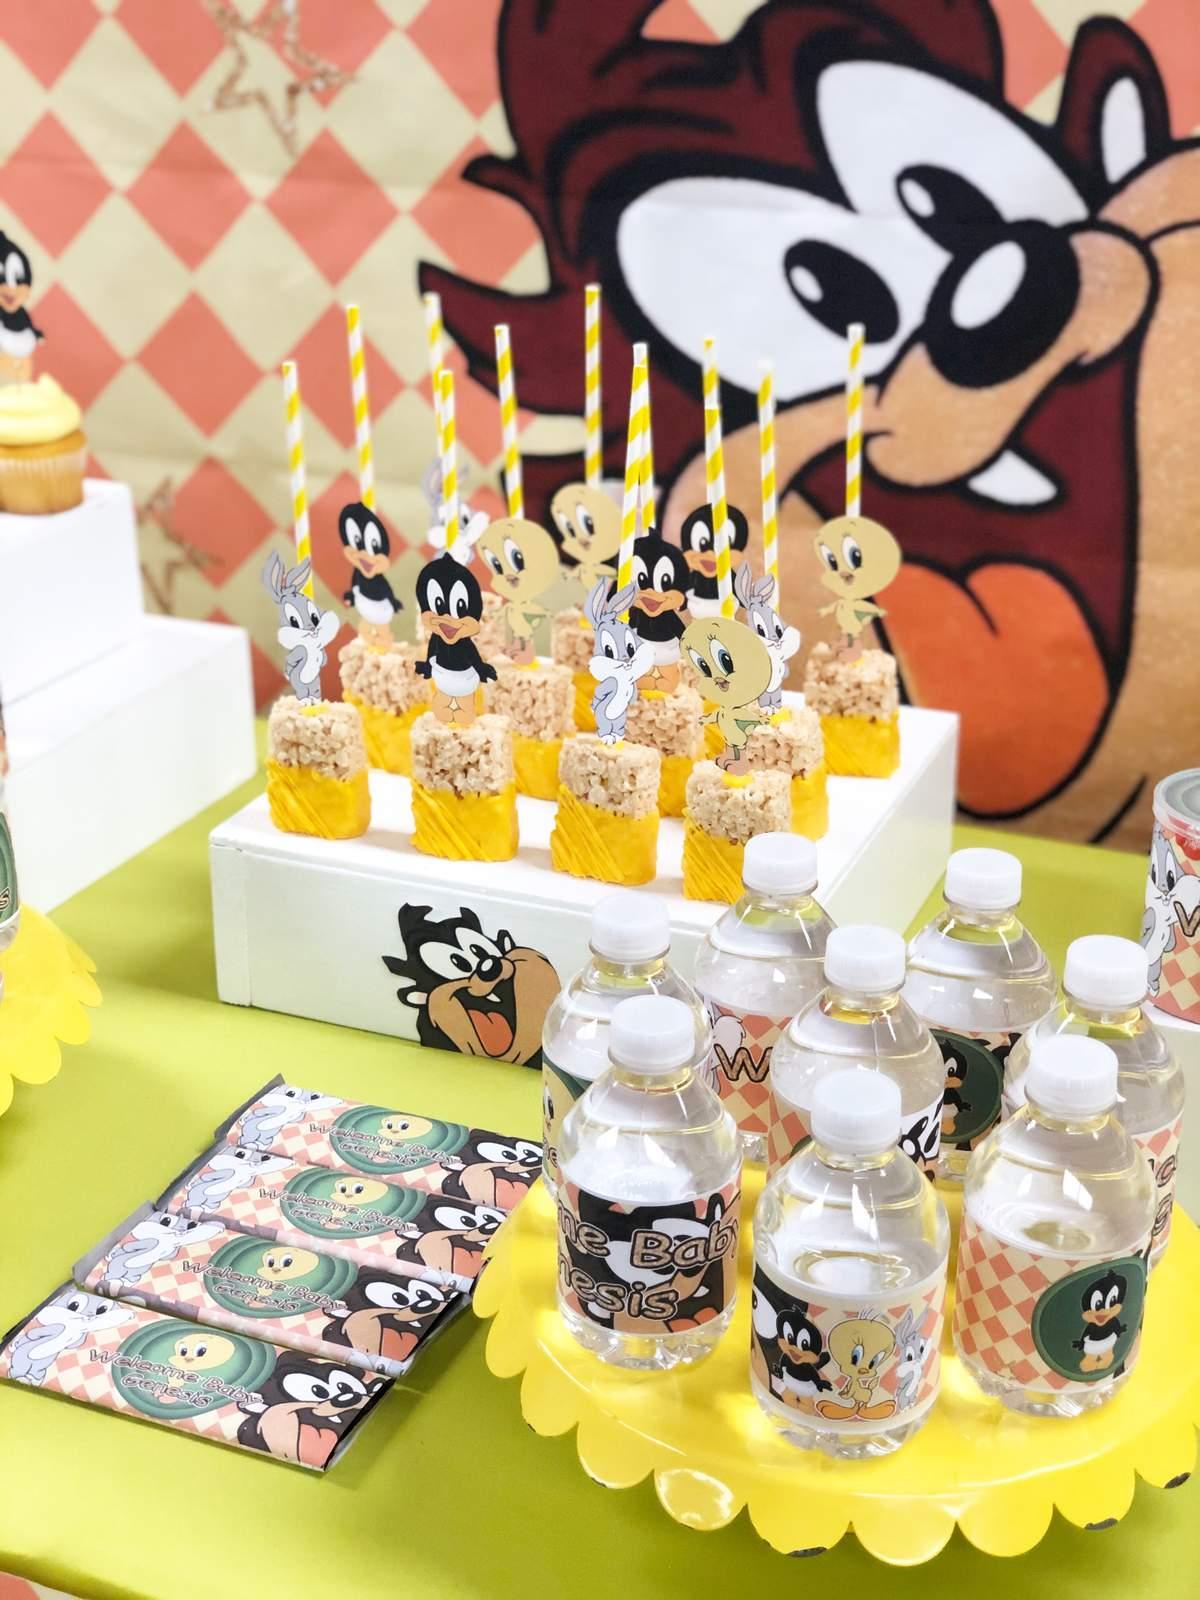 Baby Looney Tunes Theme Baby Shower : looney, tunes, theme, shower, Looney, Tunes, Shower, Party, Ideas, Photo, Catch